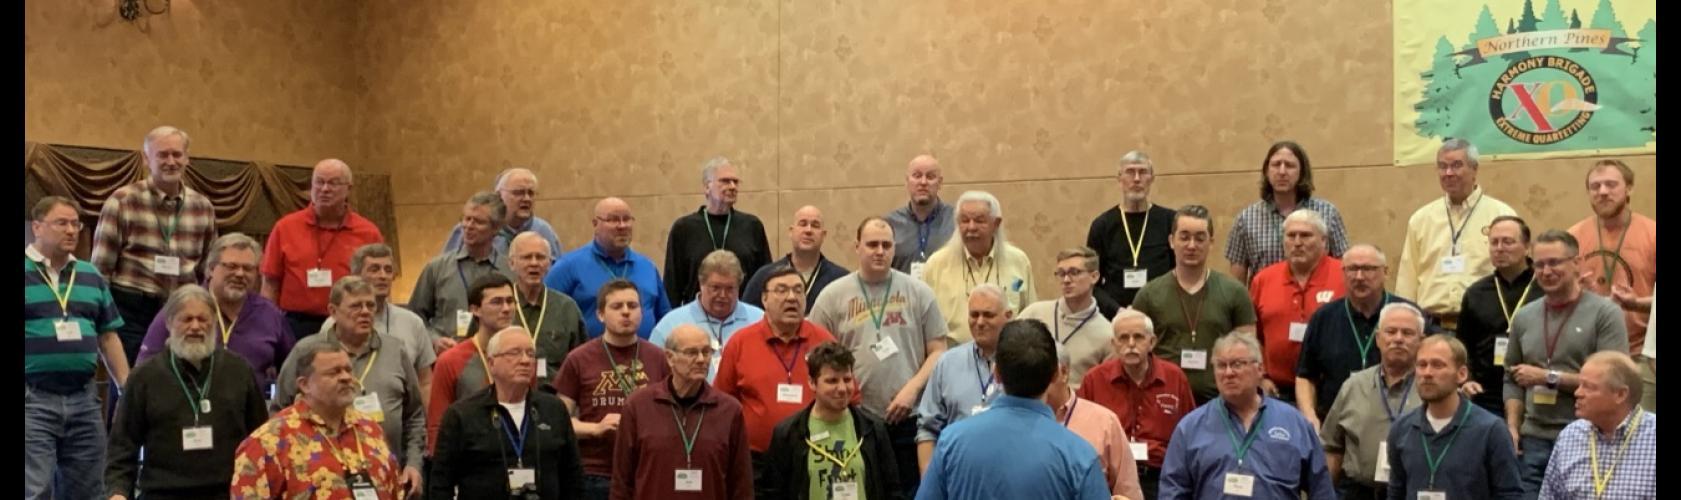 The Full Brigade Chorus of nearly 80 singers